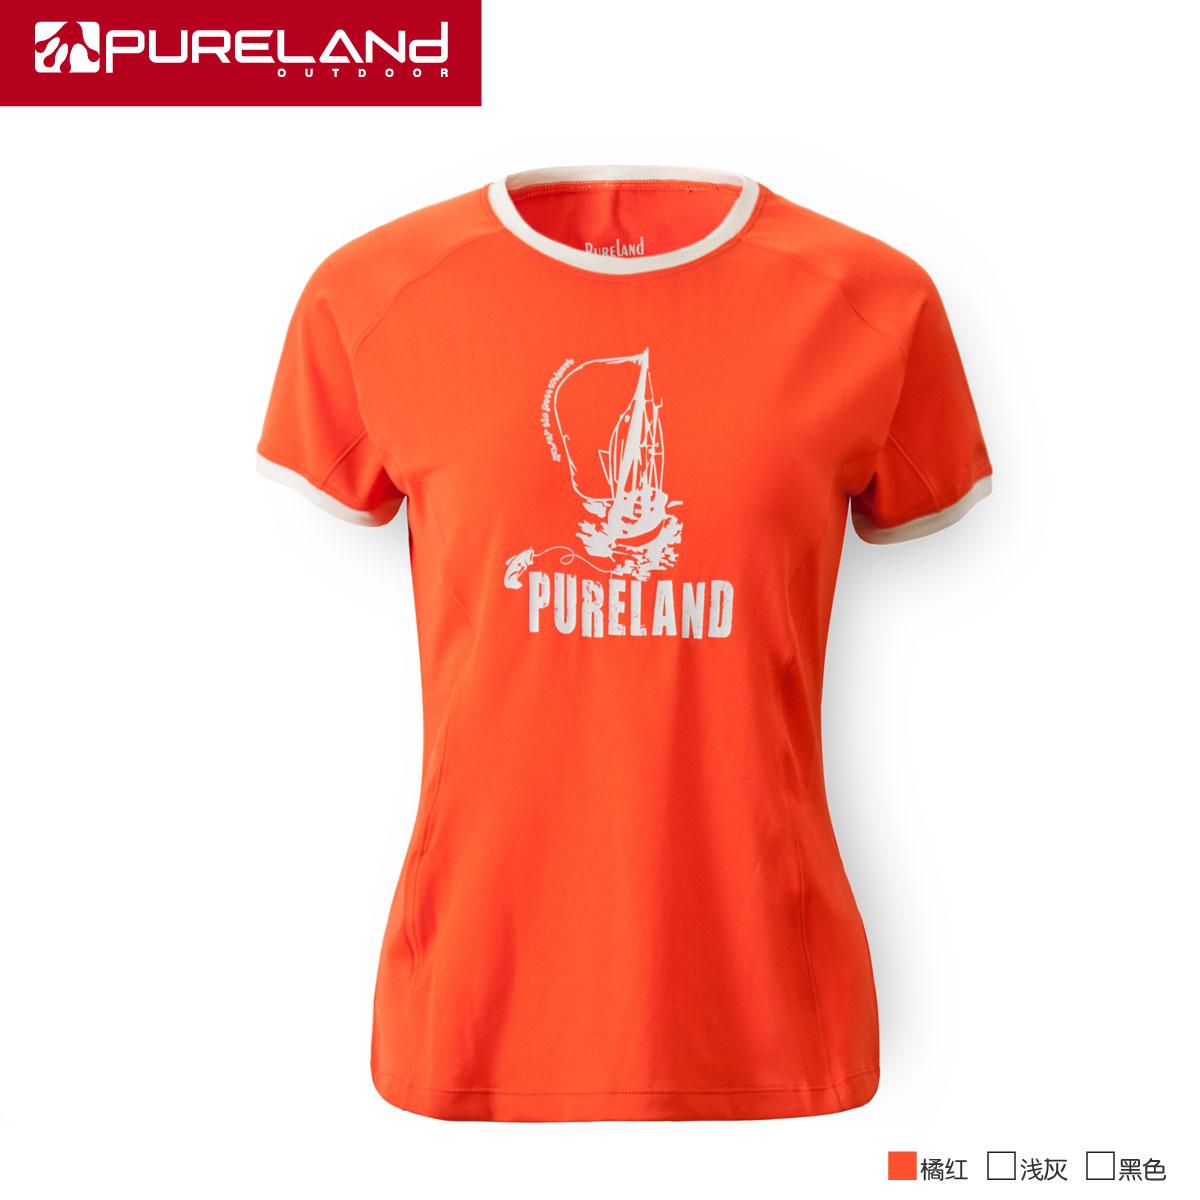 Быстросохнущая футболка Pureland g01296 Pureland / Pureland